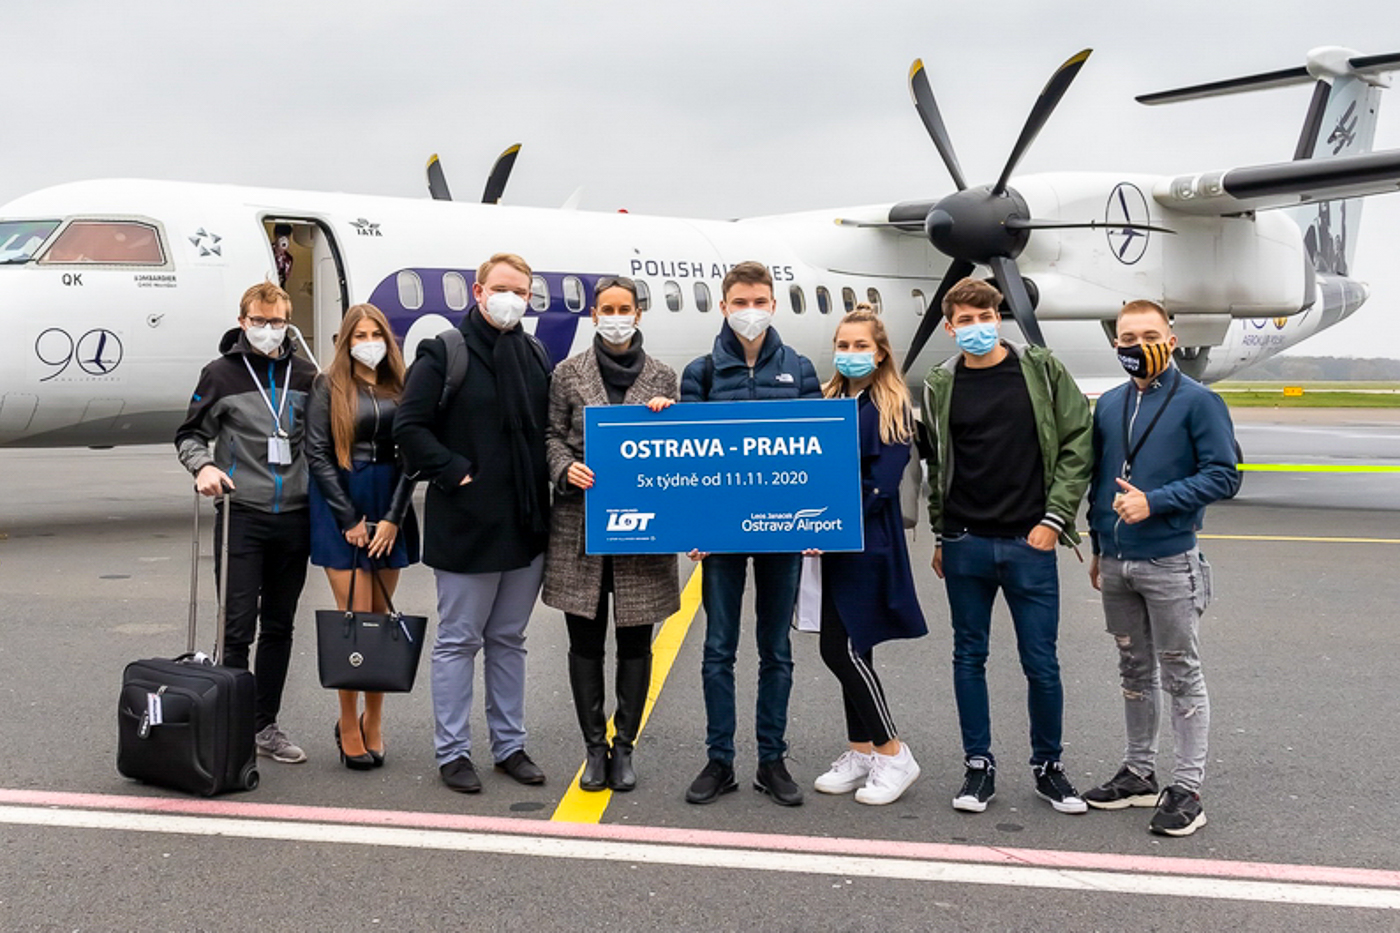 FOTOREPORTÁŽ: Inaugurační let LOT Polish Airlines Ostrava-Praha